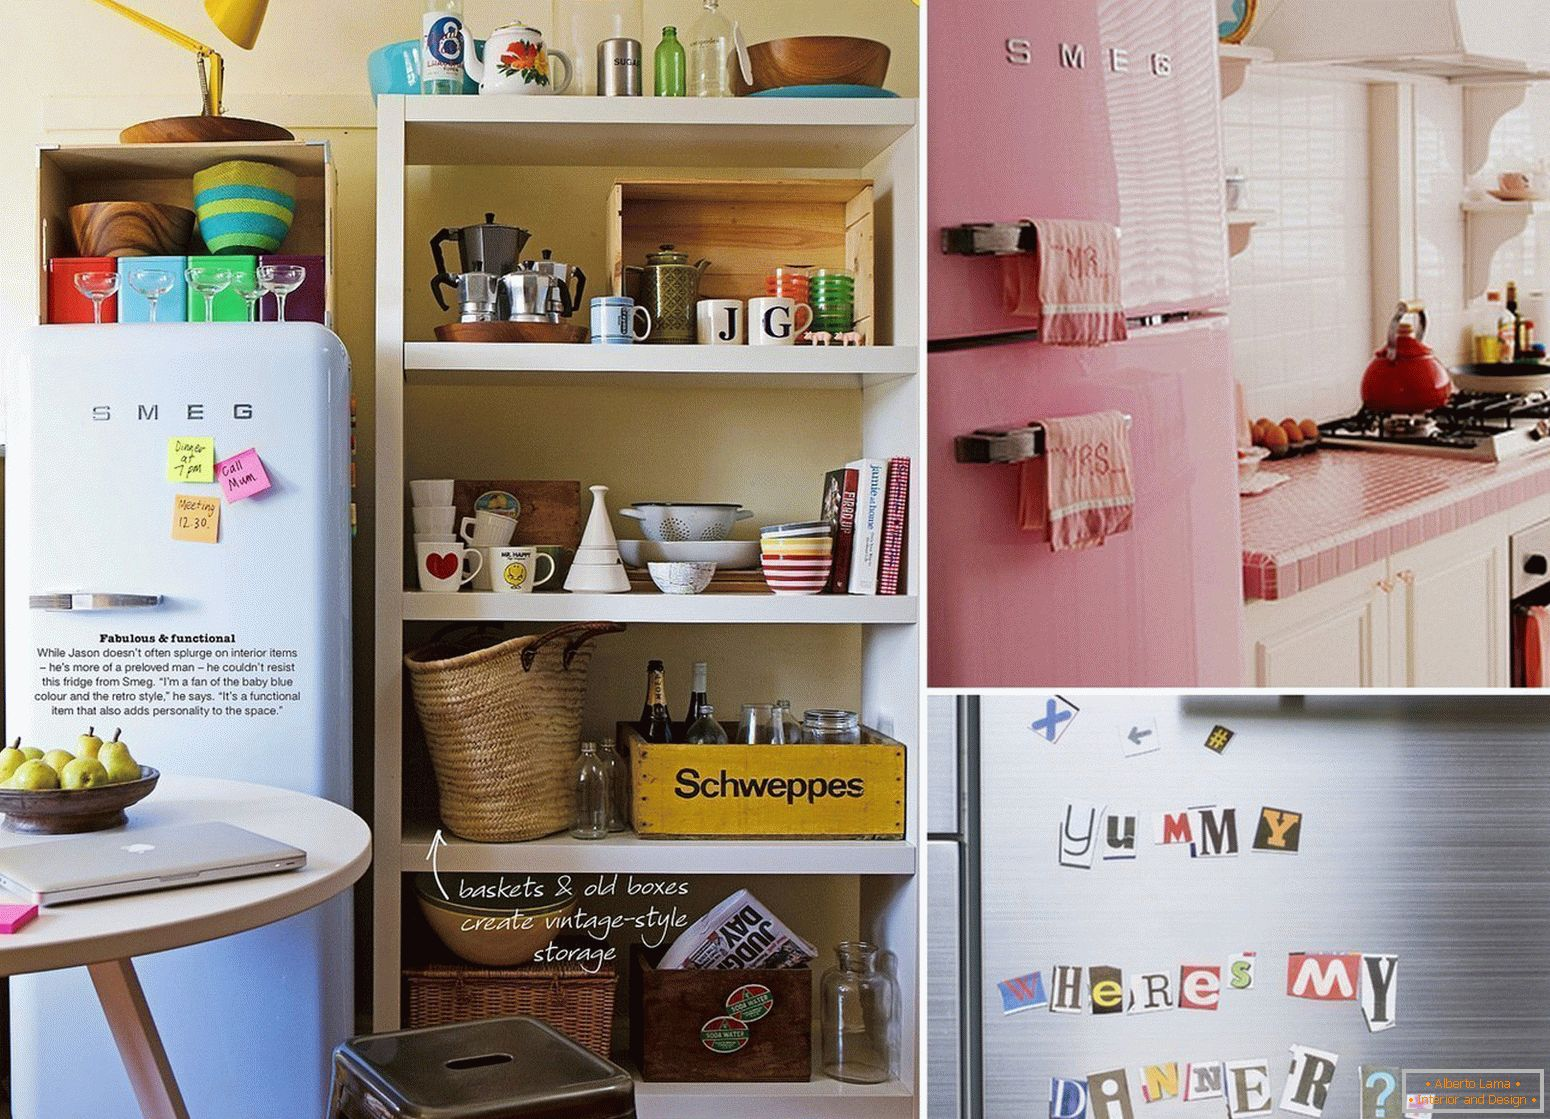 Smeg Kühlschrank Angebot : Smeg kühlschrank tür geht schwer auf 1809 ggm mantel